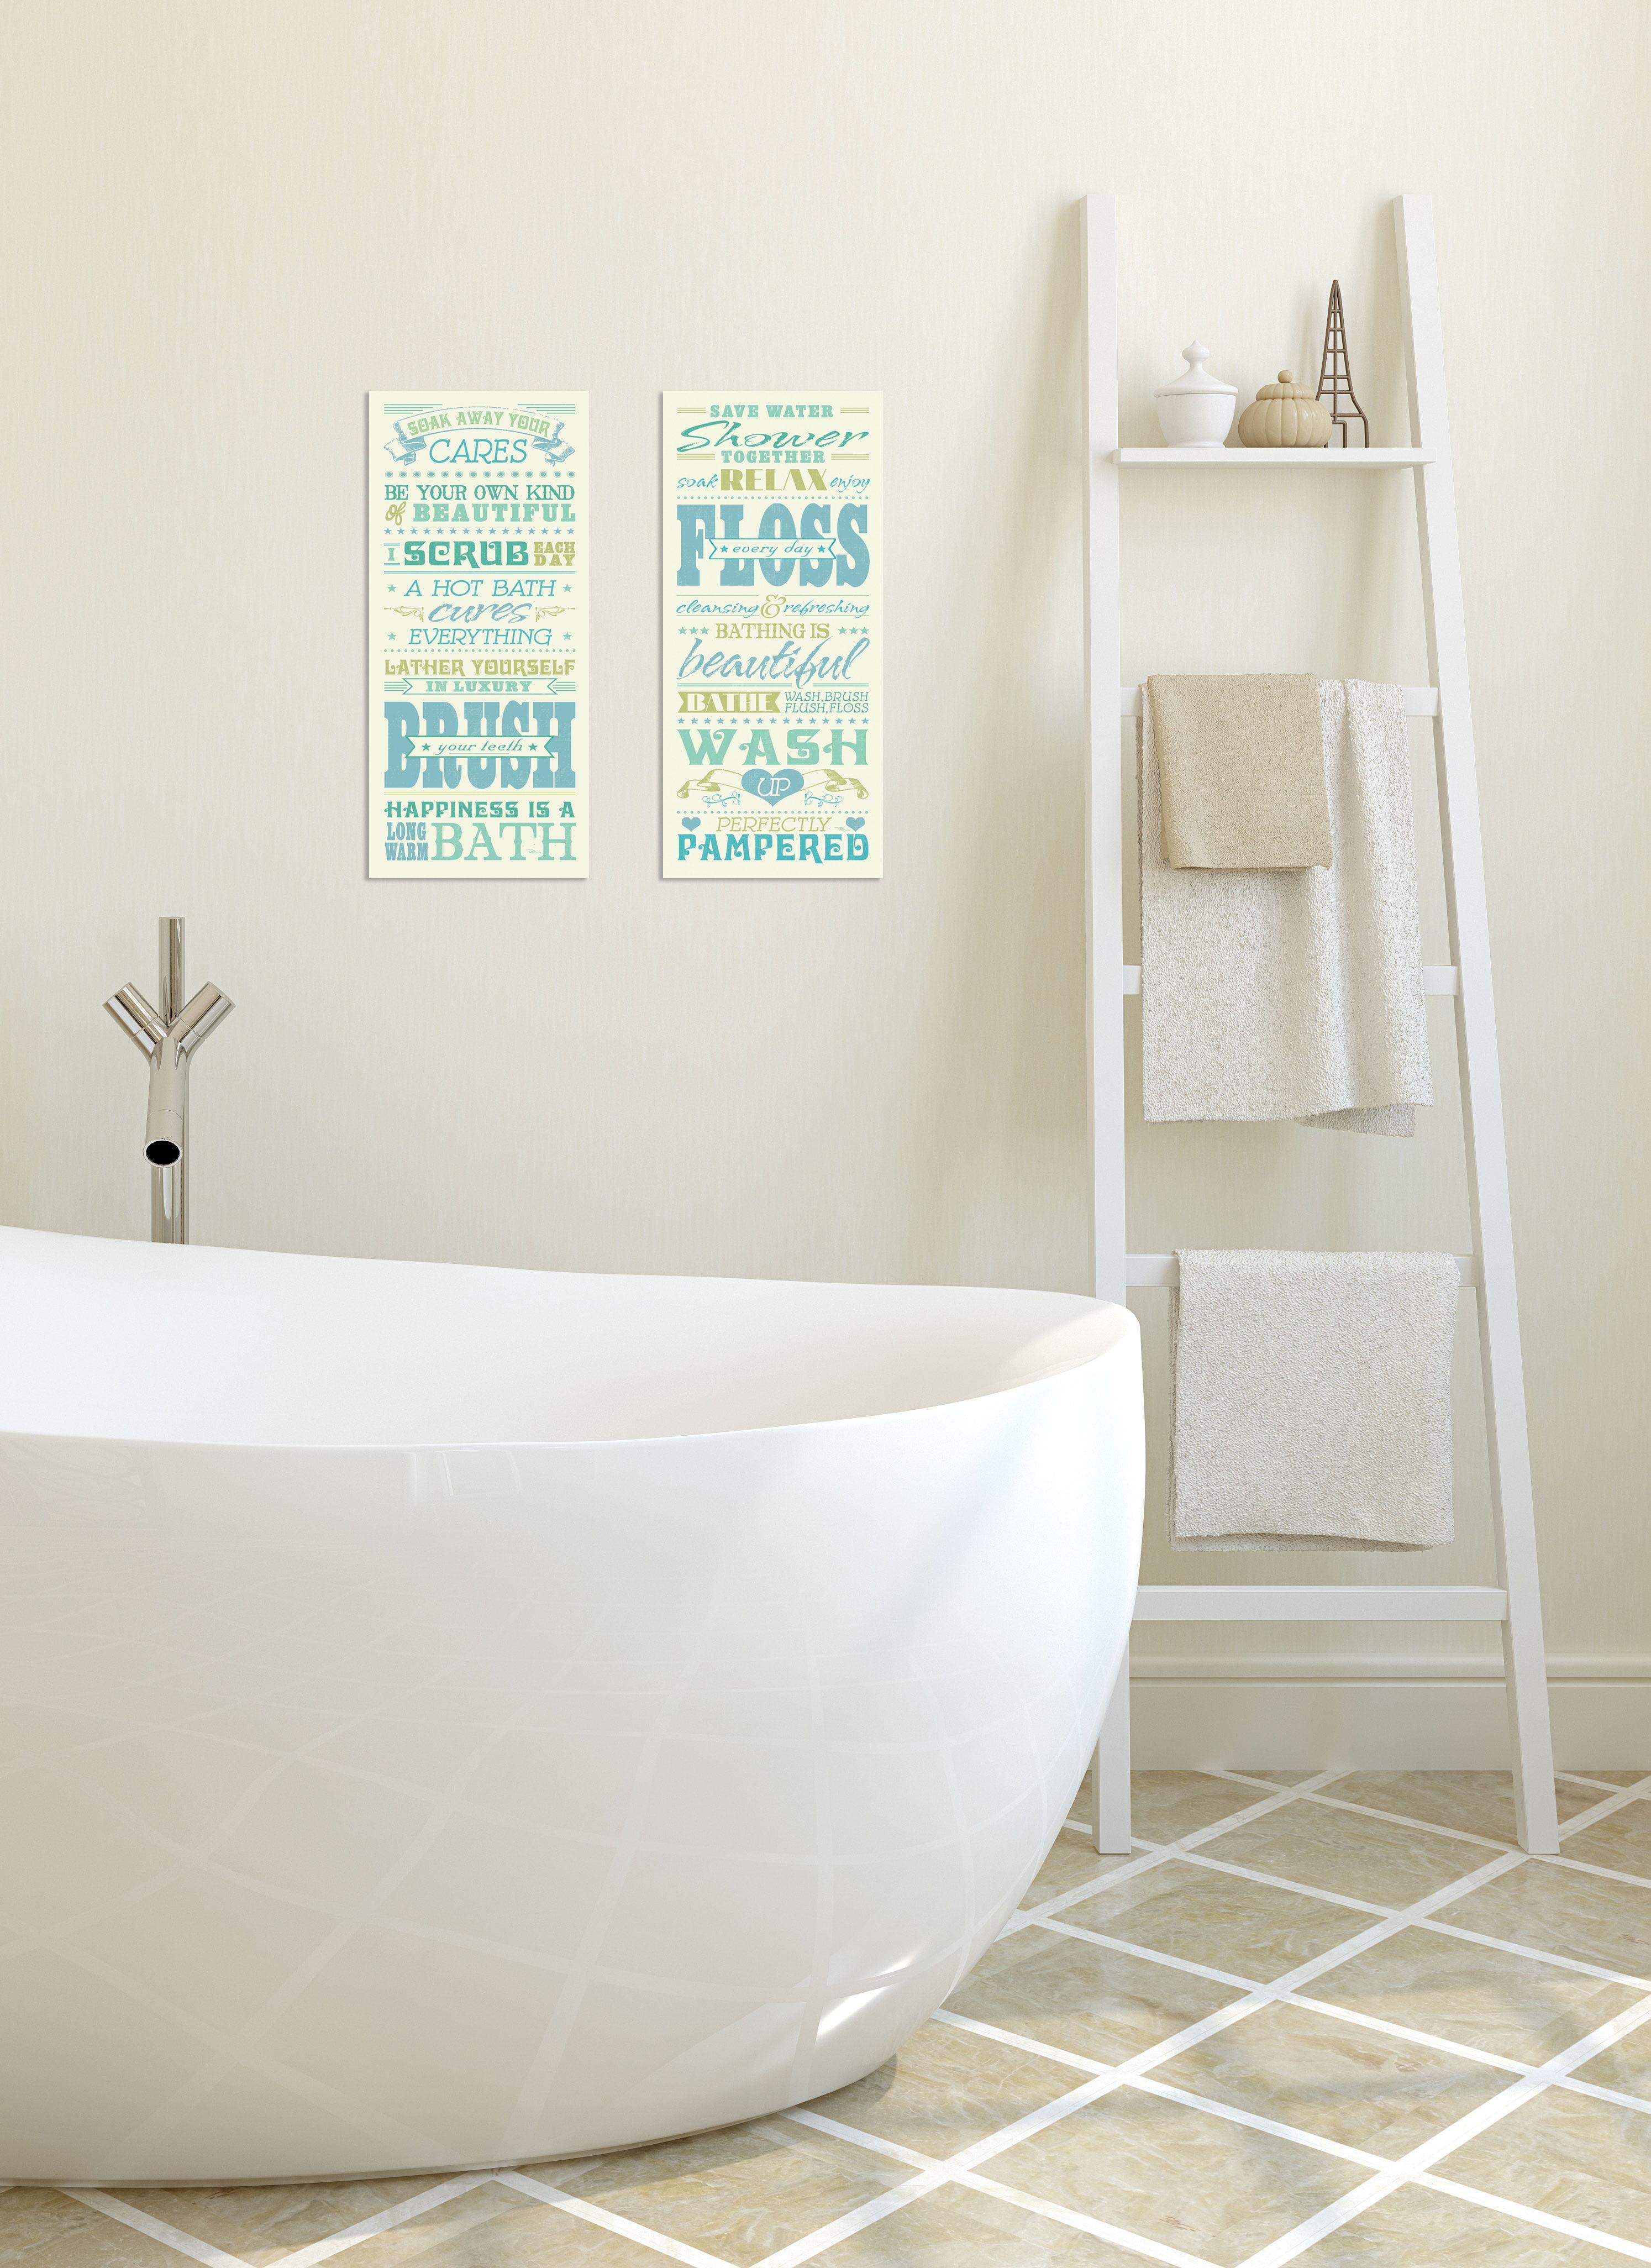 Gango Home Decor Bath Shower Rules Typography Bathroom Wall Art Two Blue 8x18in Unframed Paper Prints Walmart Com Walmart Com